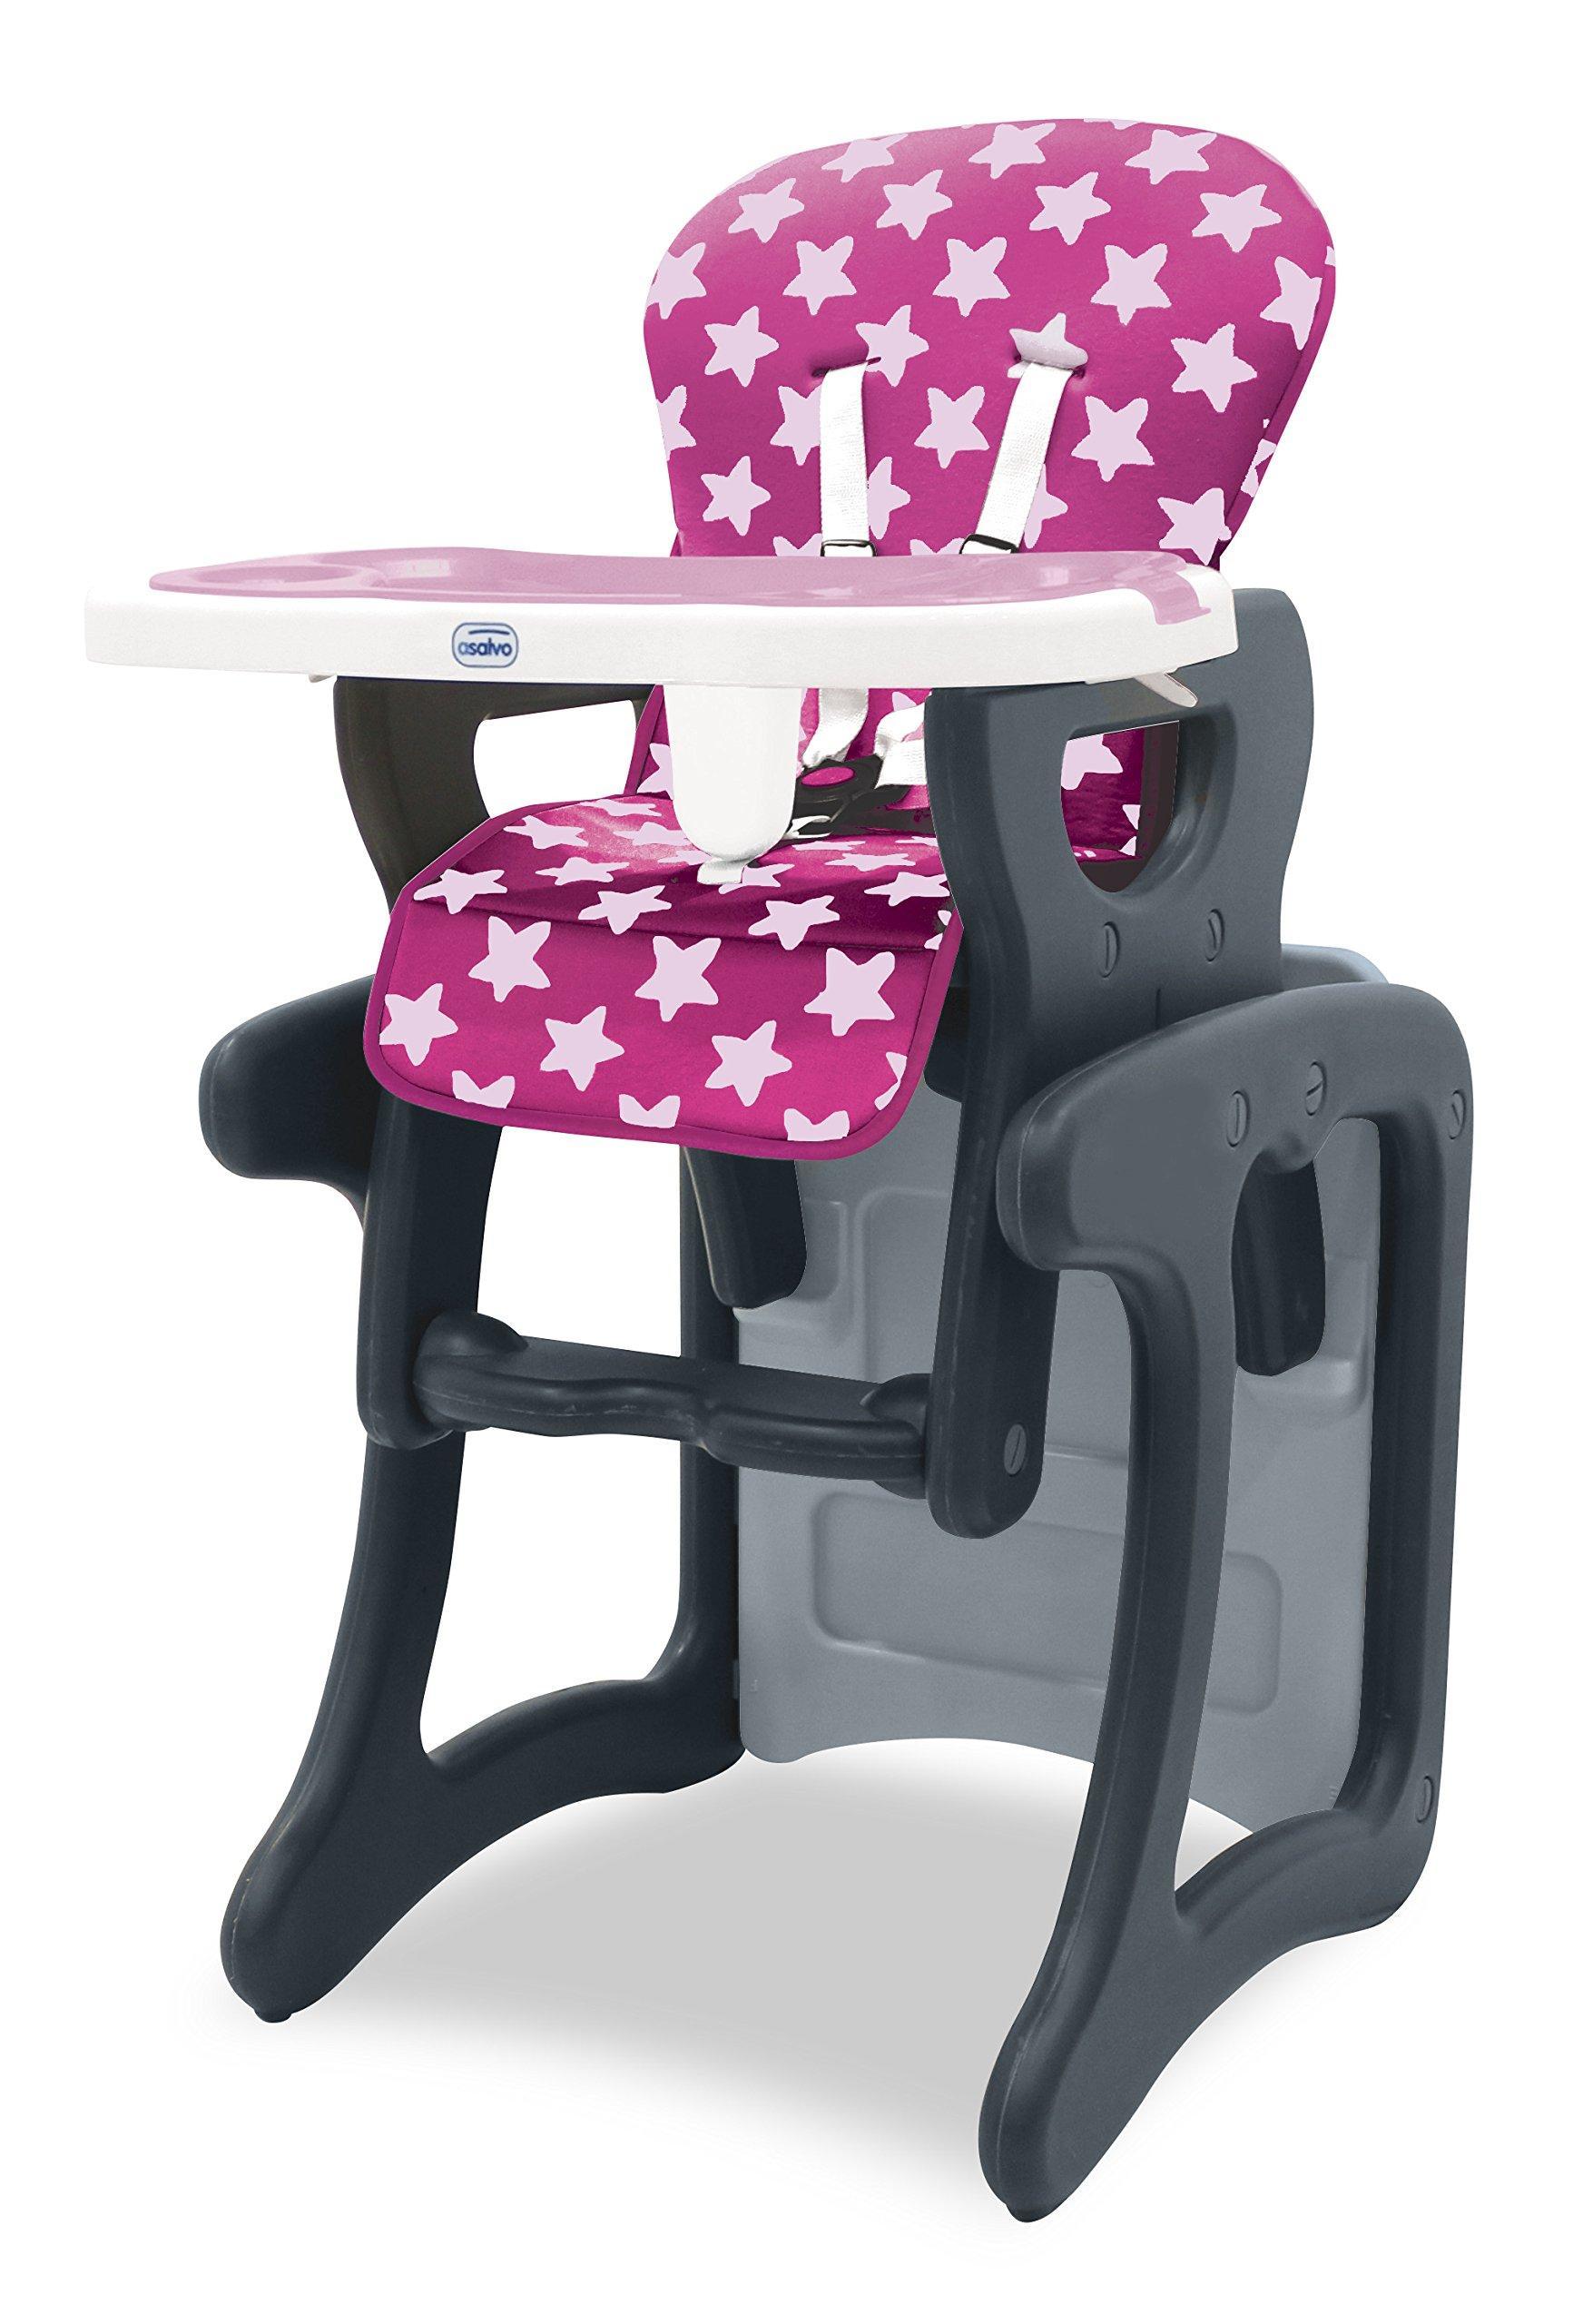 Chaise haute convertible